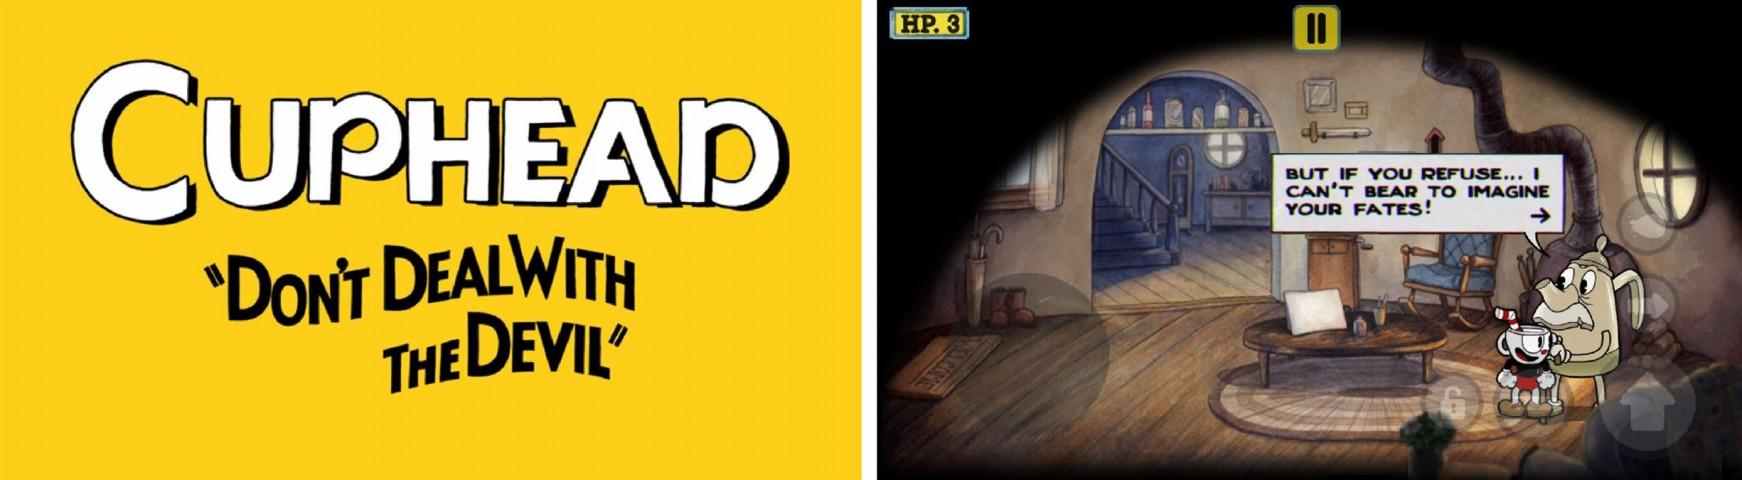 cuphead-apk.jpg